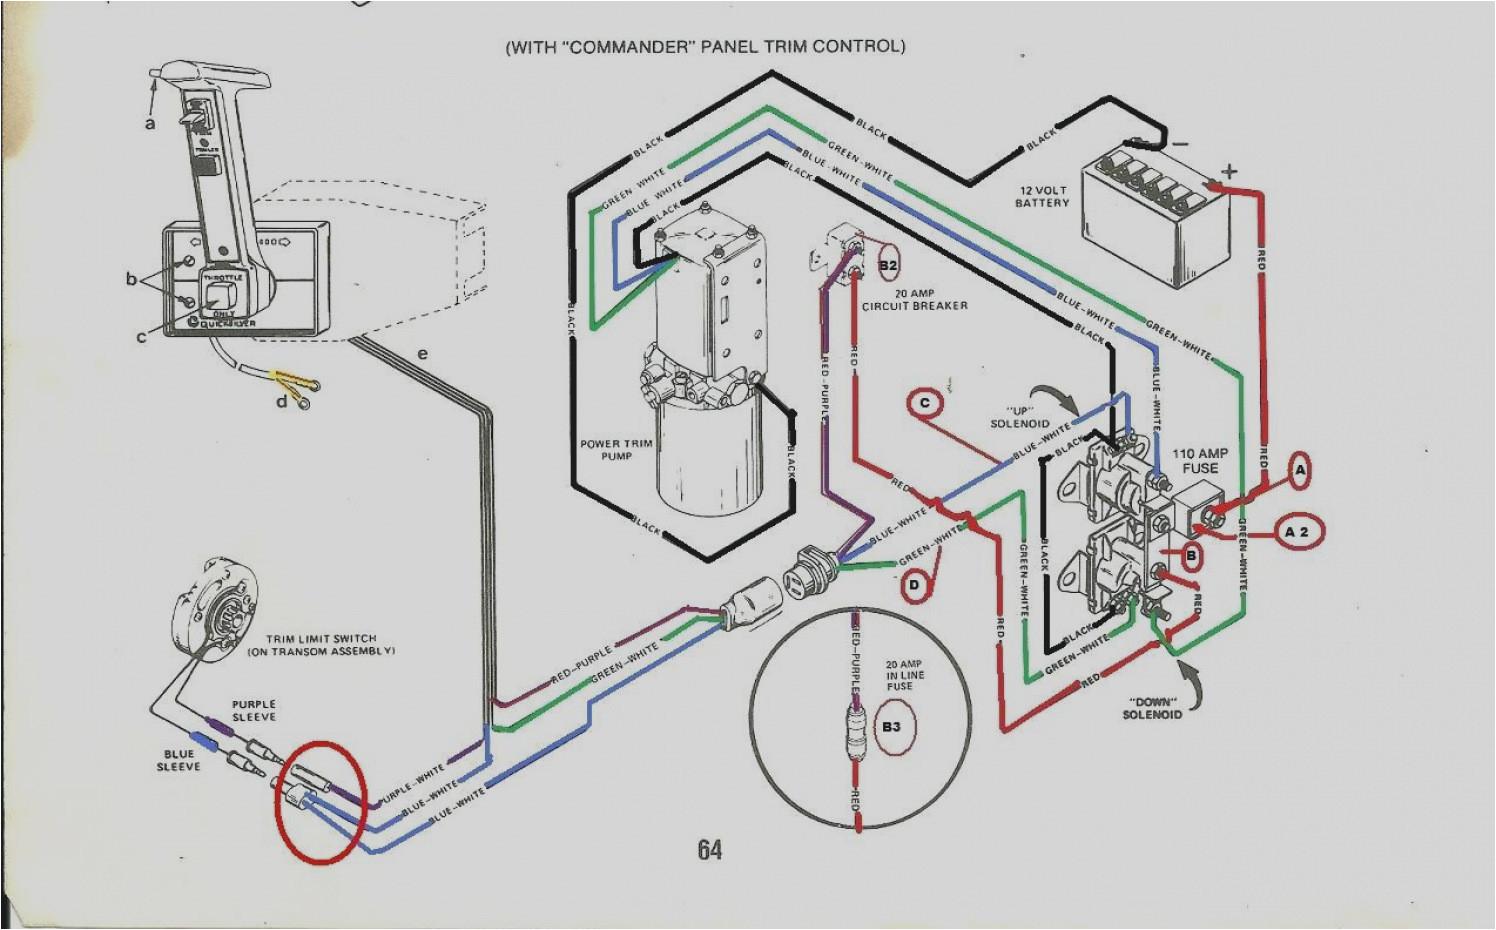 1996 ez go battery wiring diagram wiring diagram toolbox club car battery diagram 36 volt 1996